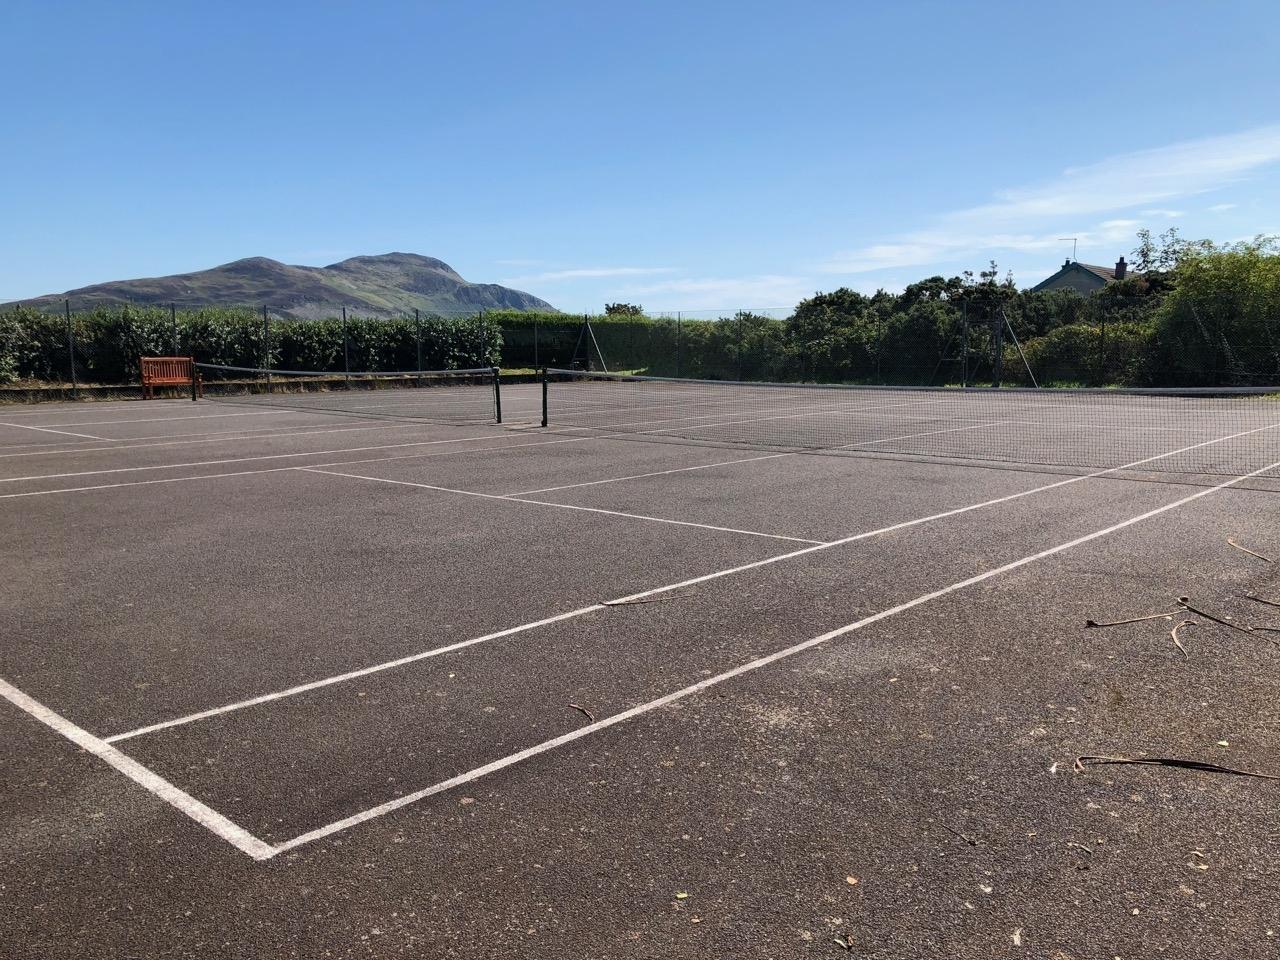 Lamlash Tennis Courts